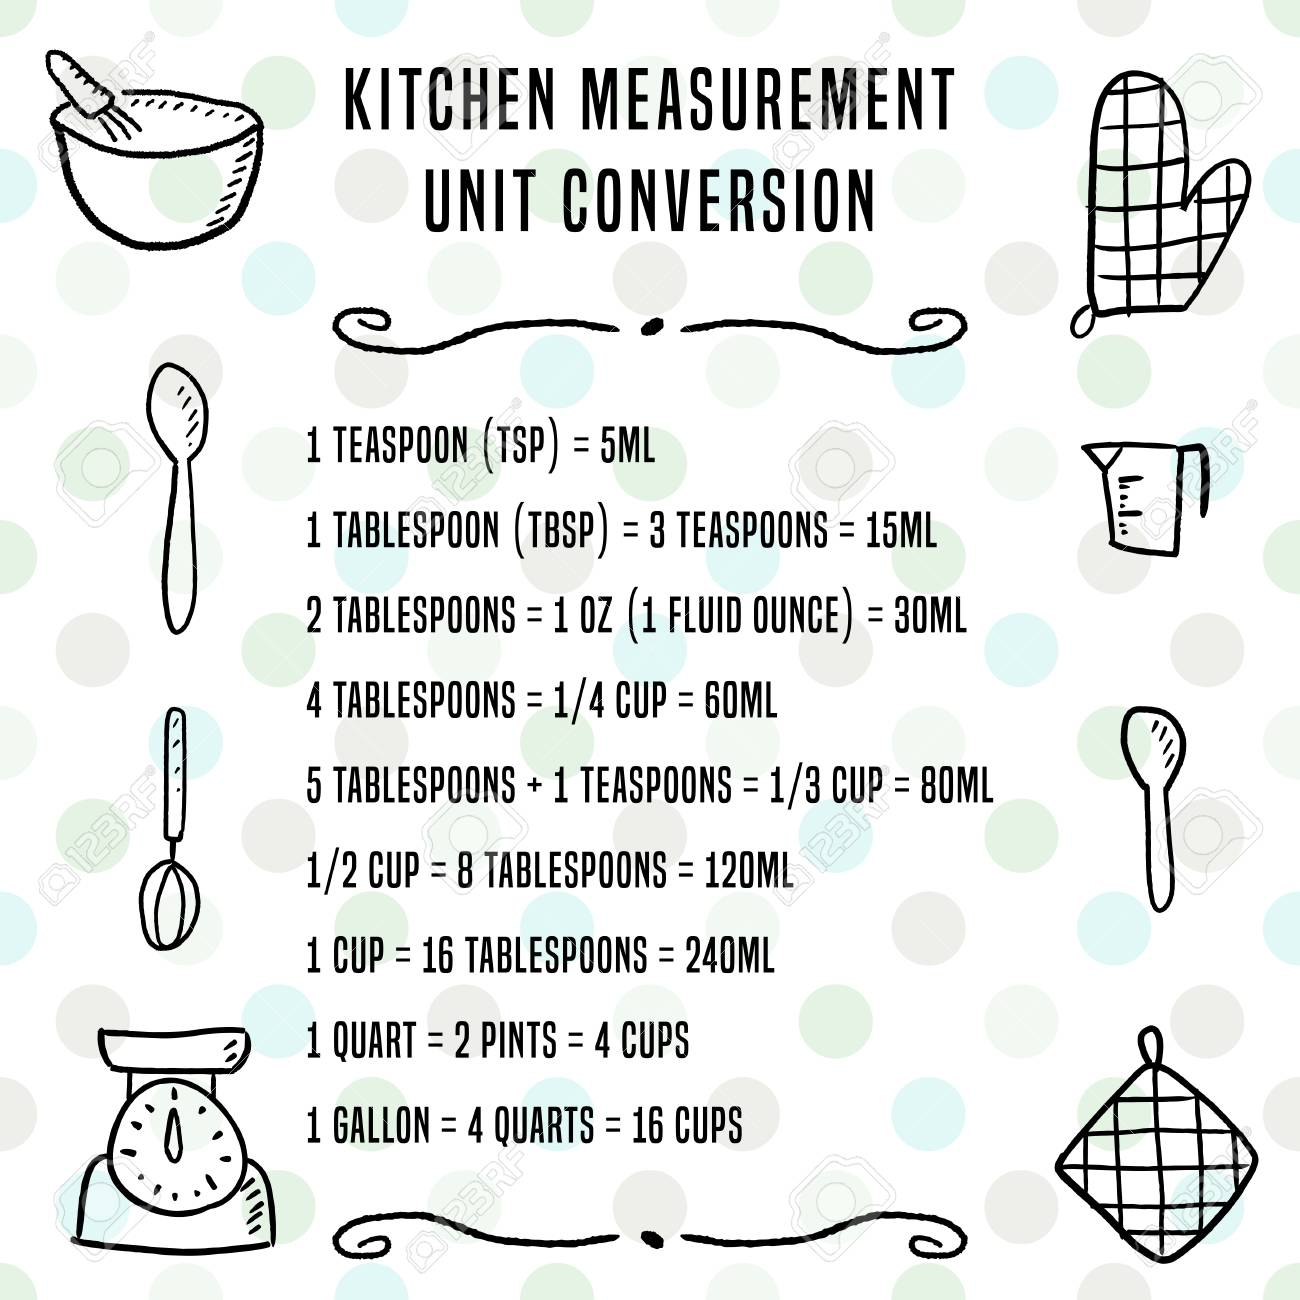 Kitchen unit conversion chart baking measurement units cooking kitchen unit conversion chart baking measurement units cooking design stock vector 88430628 geenschuldenfo Choice Image